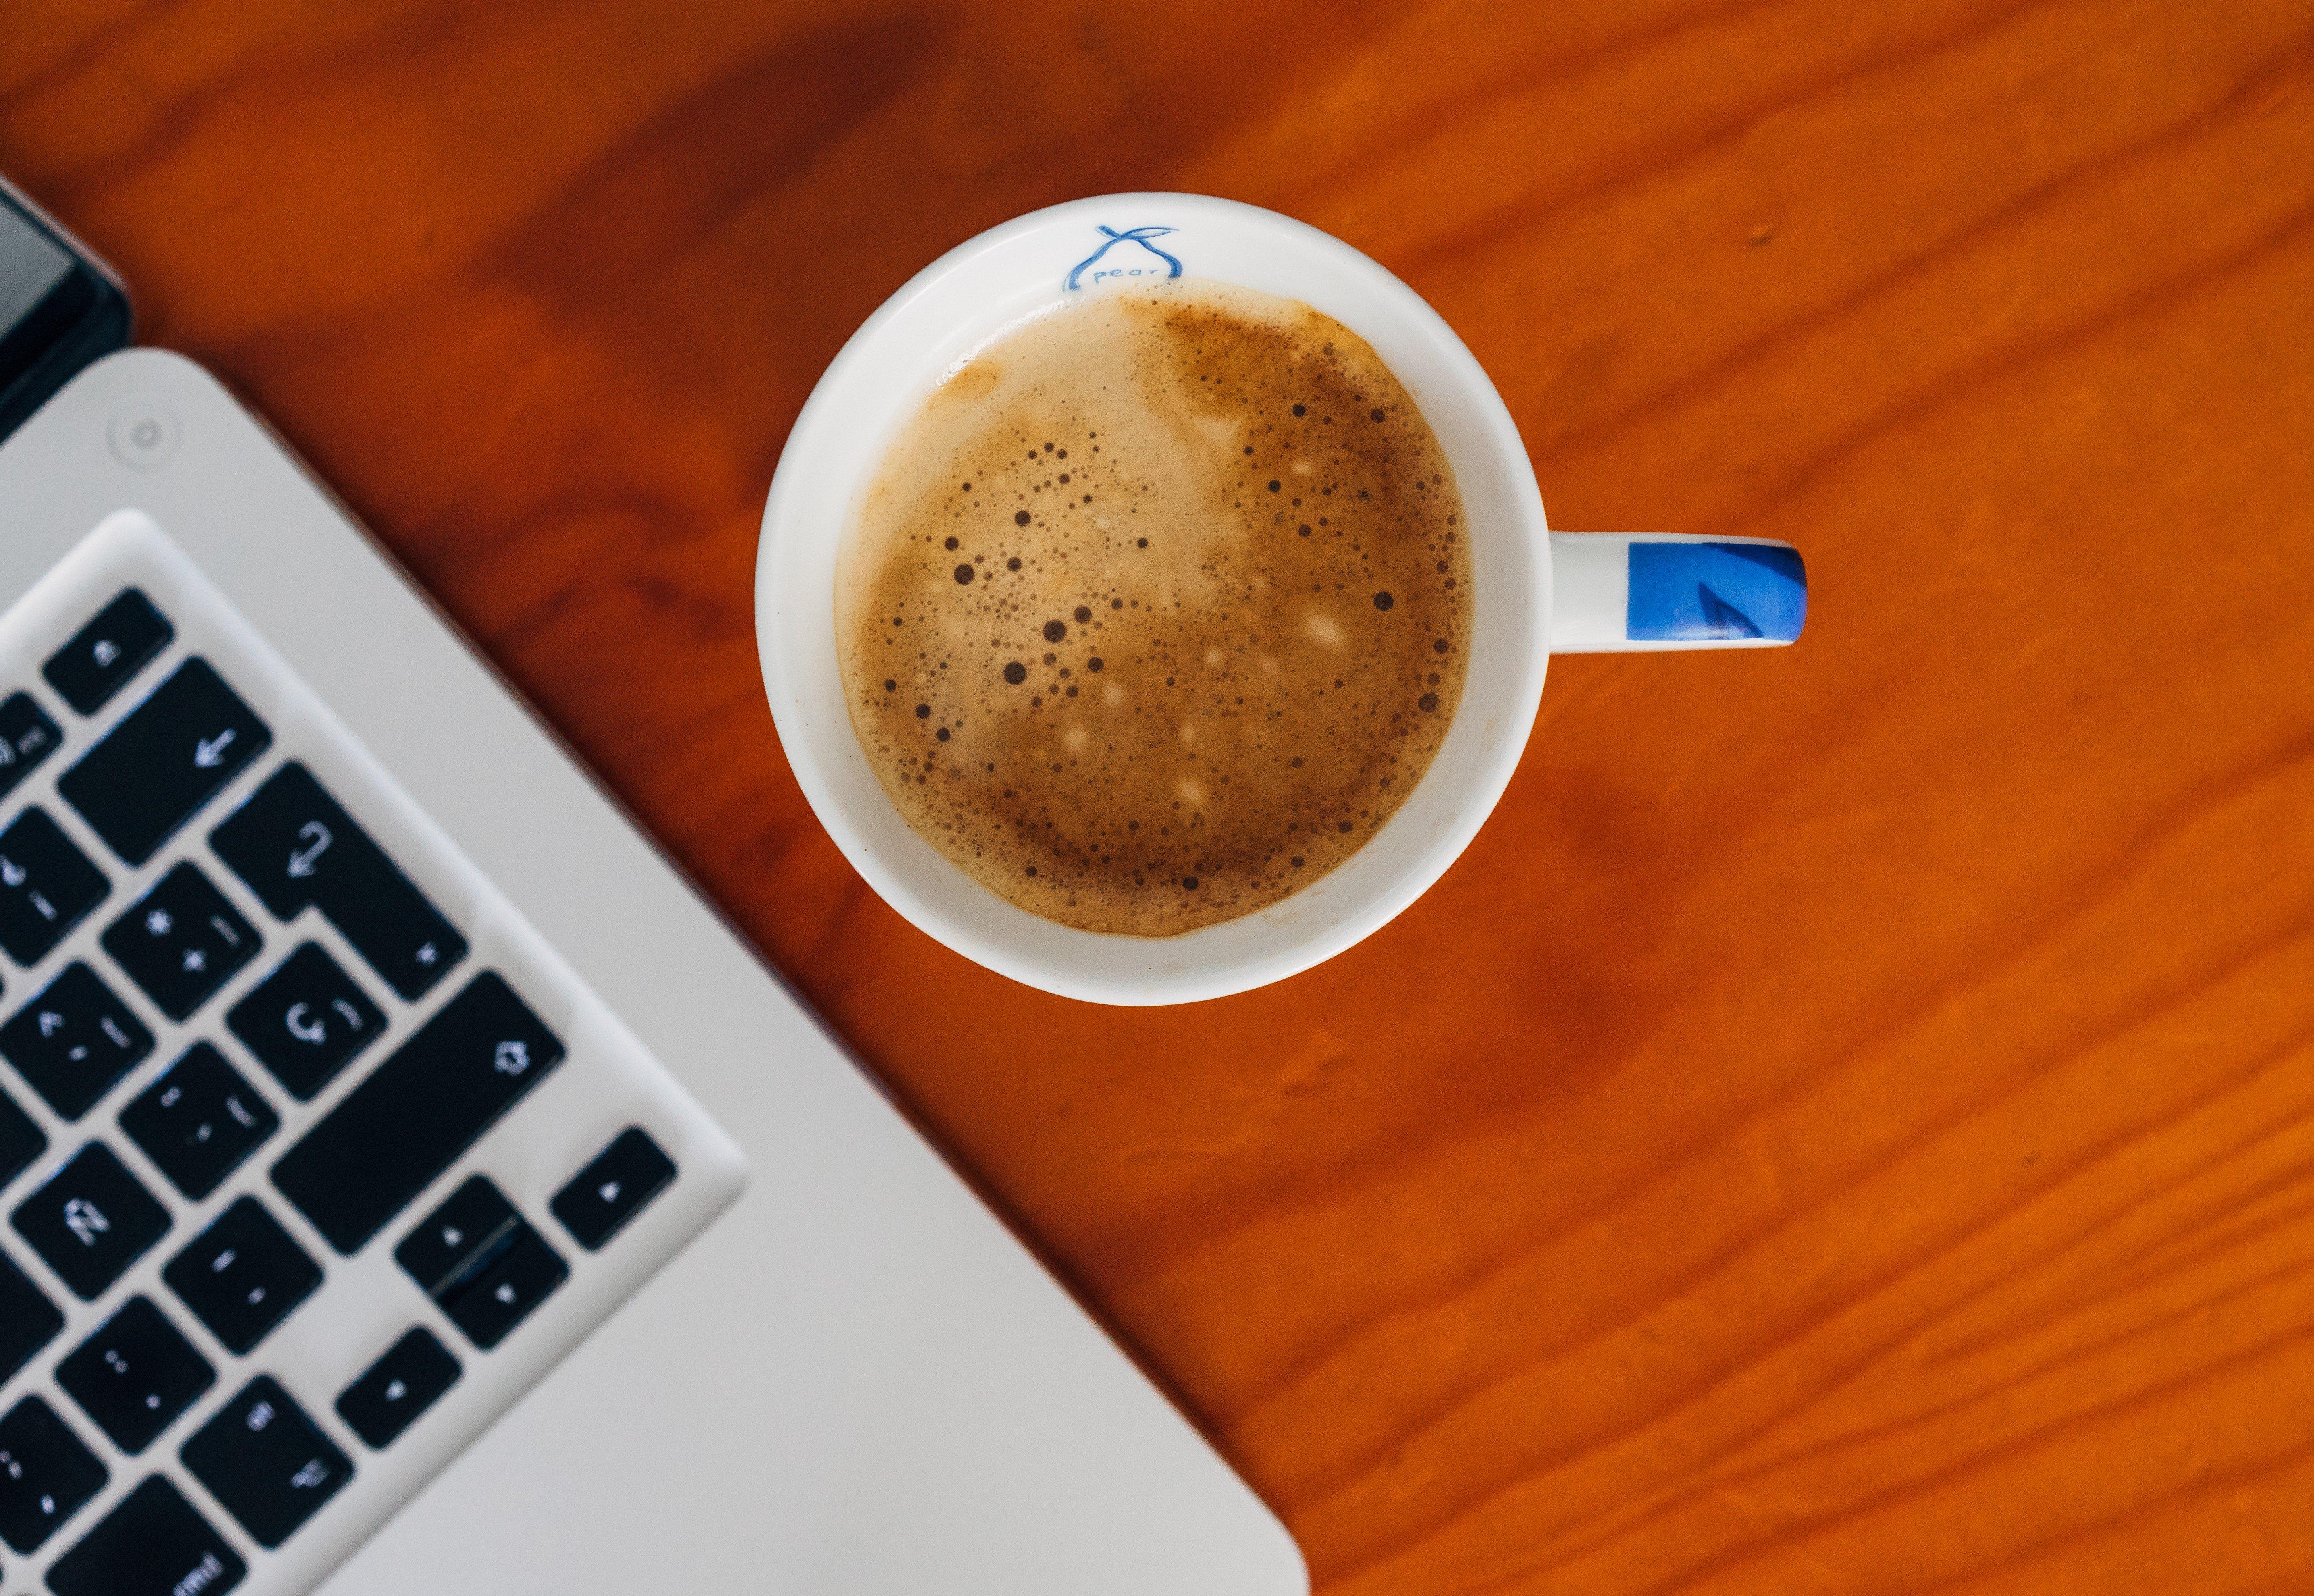 coffee, Macintosh Wallpaper